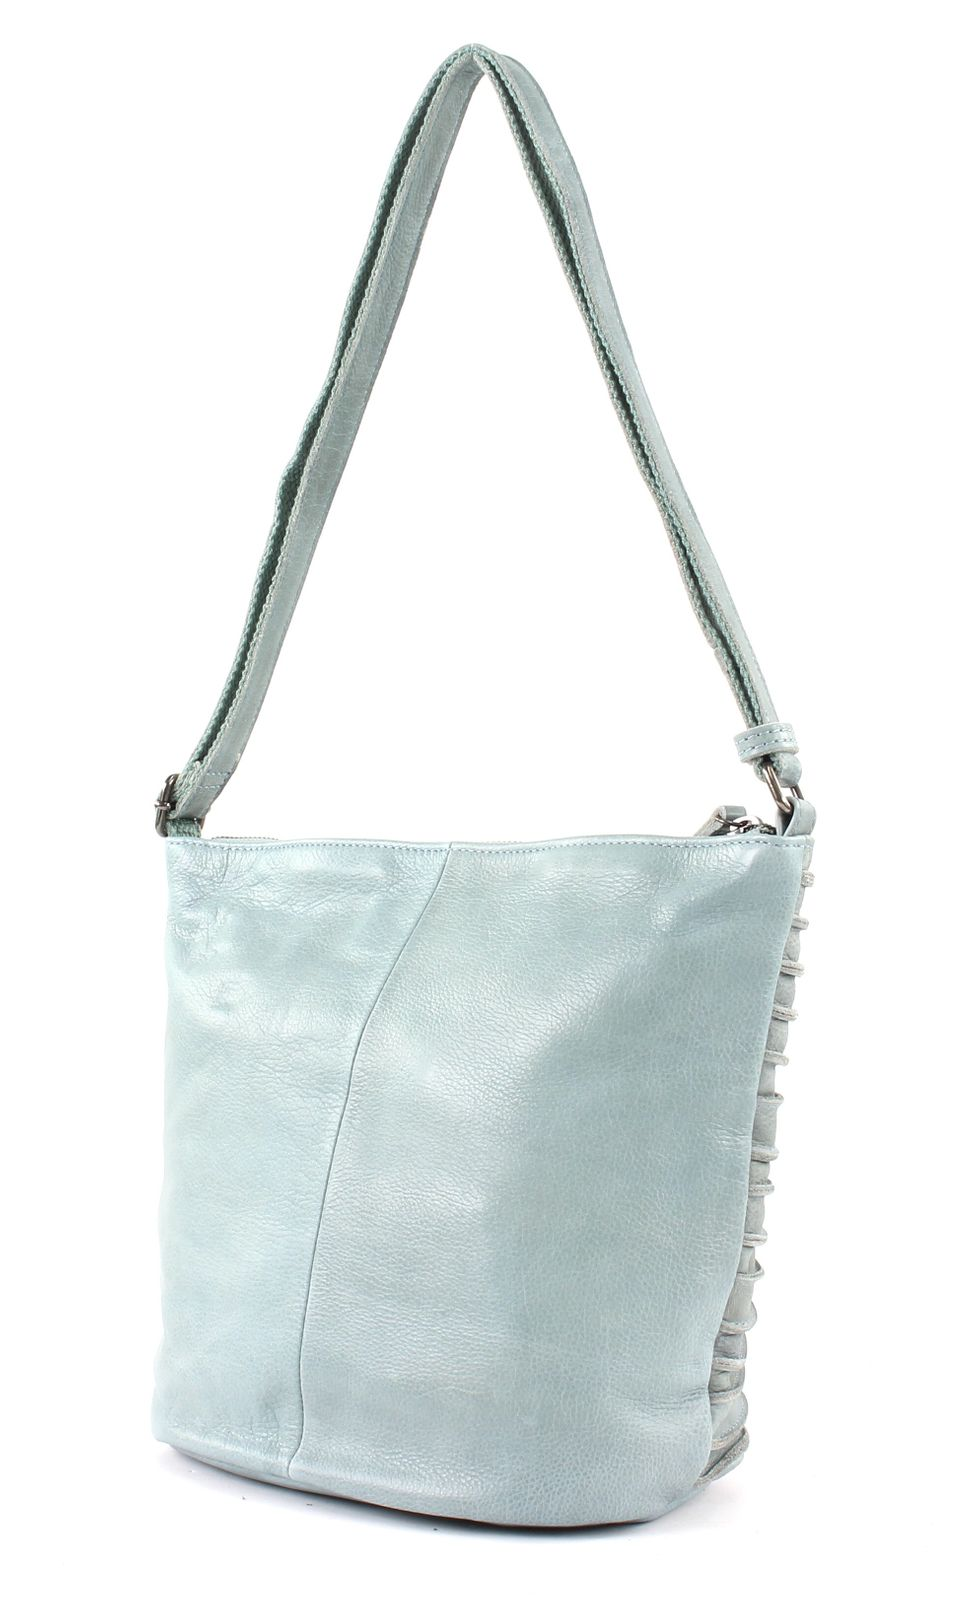 8b705dd54f22e FREDsBRUDER Bestseller Riffelinchen Umhängetasche Tasche Light Blue ...